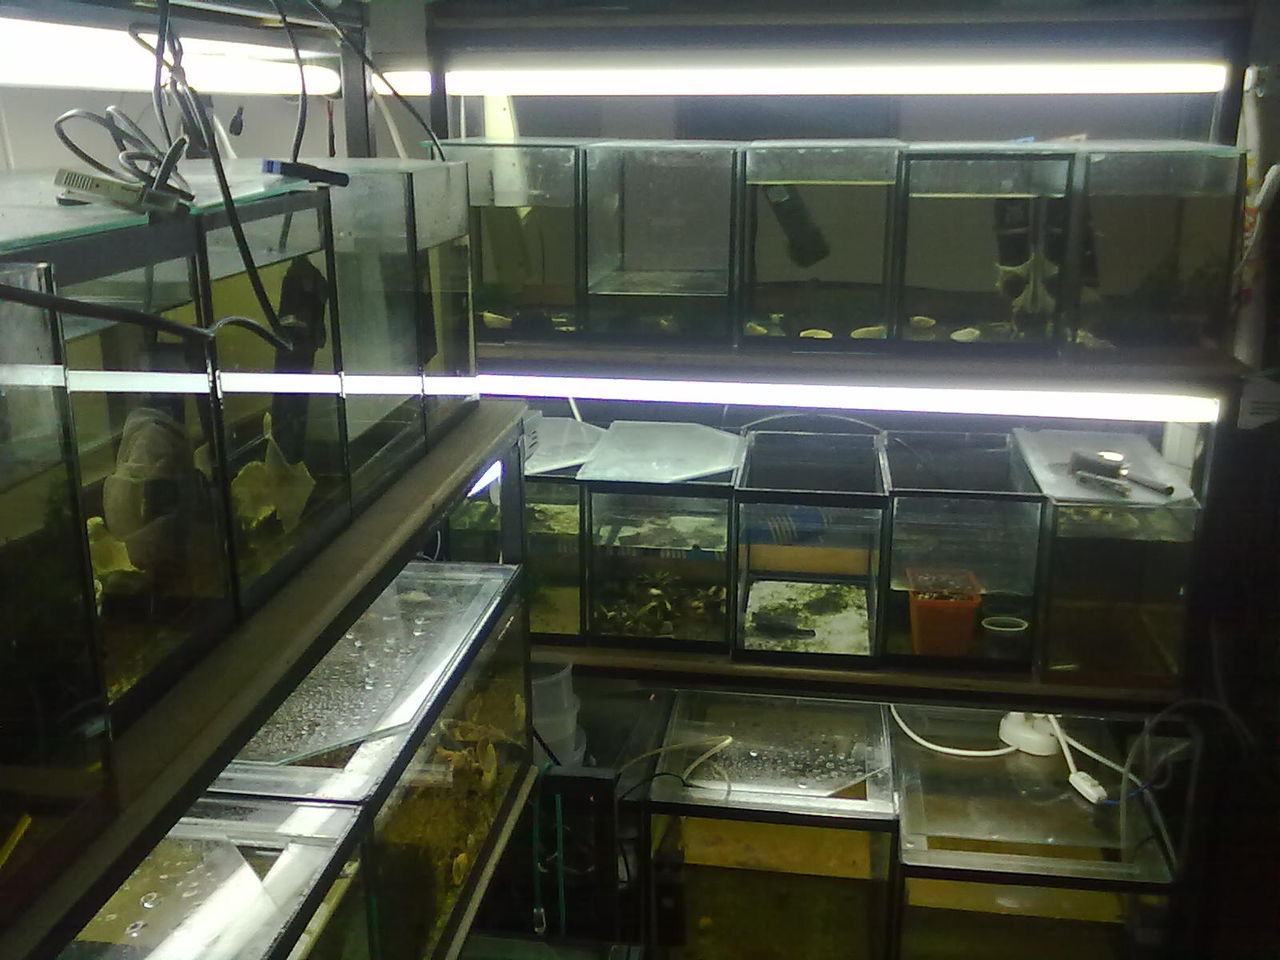 аквариумные хозяйства фото пневматический компрессор